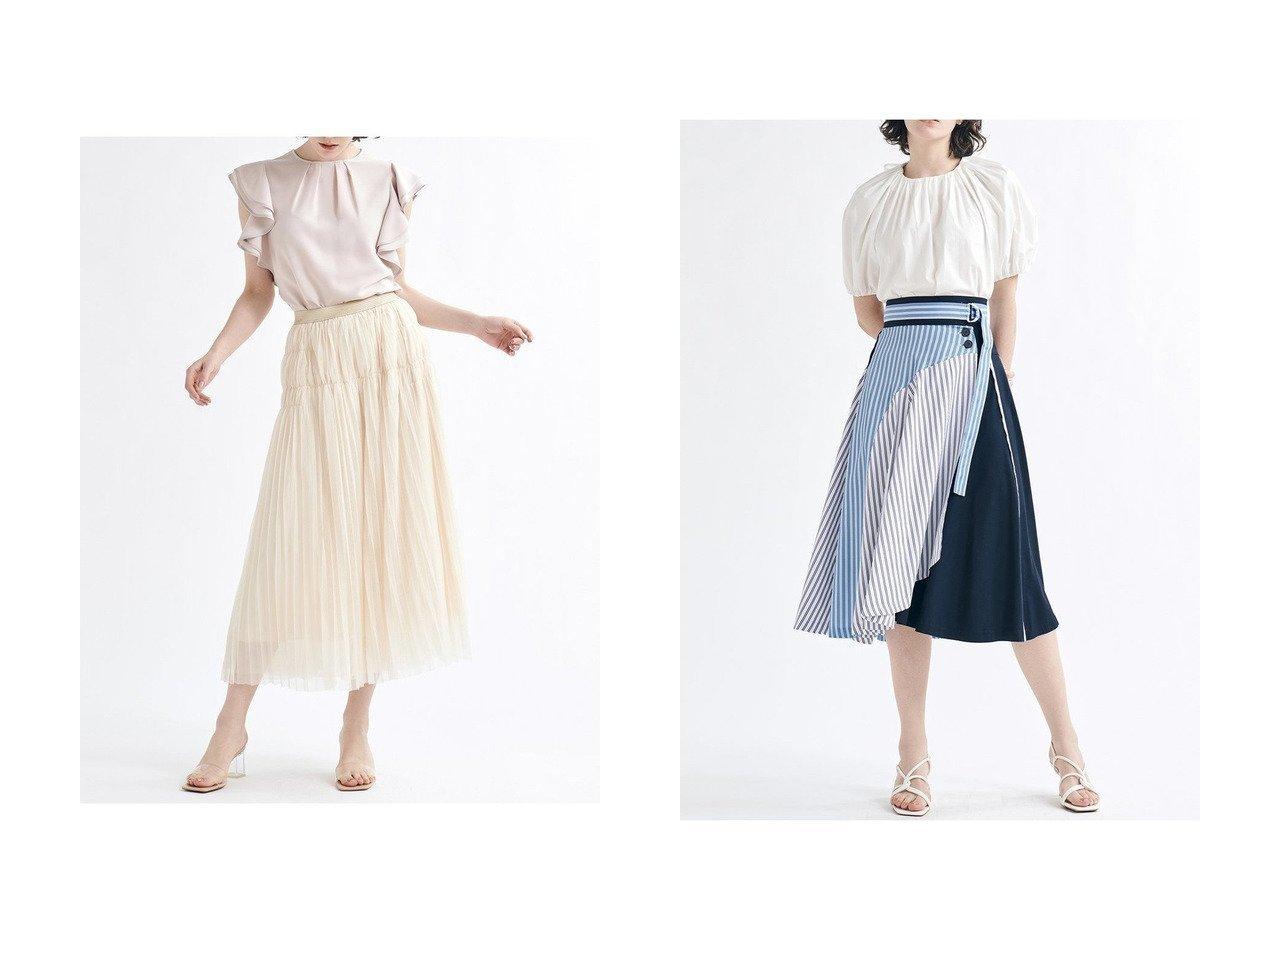 【LANVIN en Bleu/ランバン オン ブルー】のチュールロングスカート&パターンMIXスカート スカートのおすすめ!人気、トレンド・レディースファッションの通販 おすすめで人気の流行・トレンド、ファッションの通販商品 メンズファッション・キッズファッション・インテリア・家具・レディースファッション・服の通販 founy(ファニー) https://founy.com/ ファッション Fashion レディースファッション WOMEN スカート Skirt ロングスカート Long Skirt 2021年 2021 2021 春夏 S/S SS Spring/Summer 2021 S/S 春夏 SS Spring/Summer エレガント チュール フォーマル プリーツ リラックス ロング 春 Spring  ID:crp329100000024751